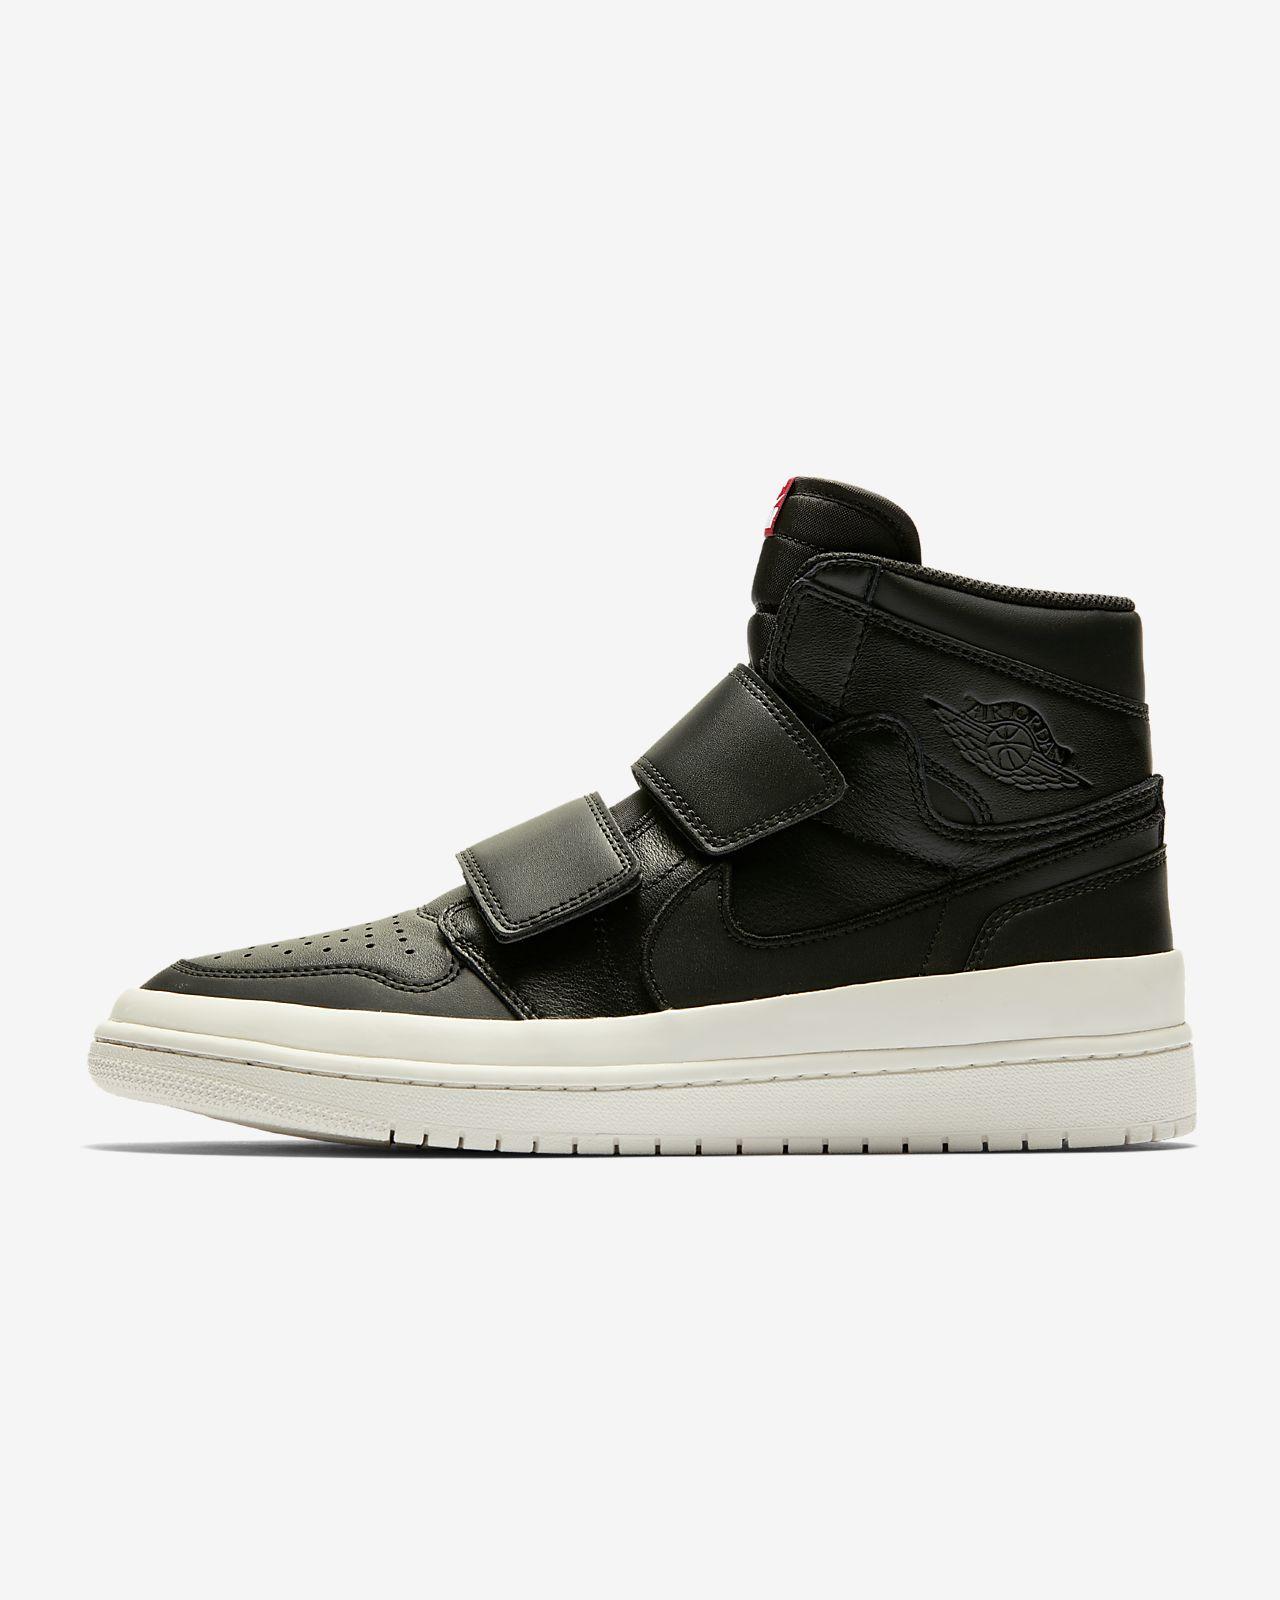 Air Jordan 1 Retro High Double-Strap Men's Shoe